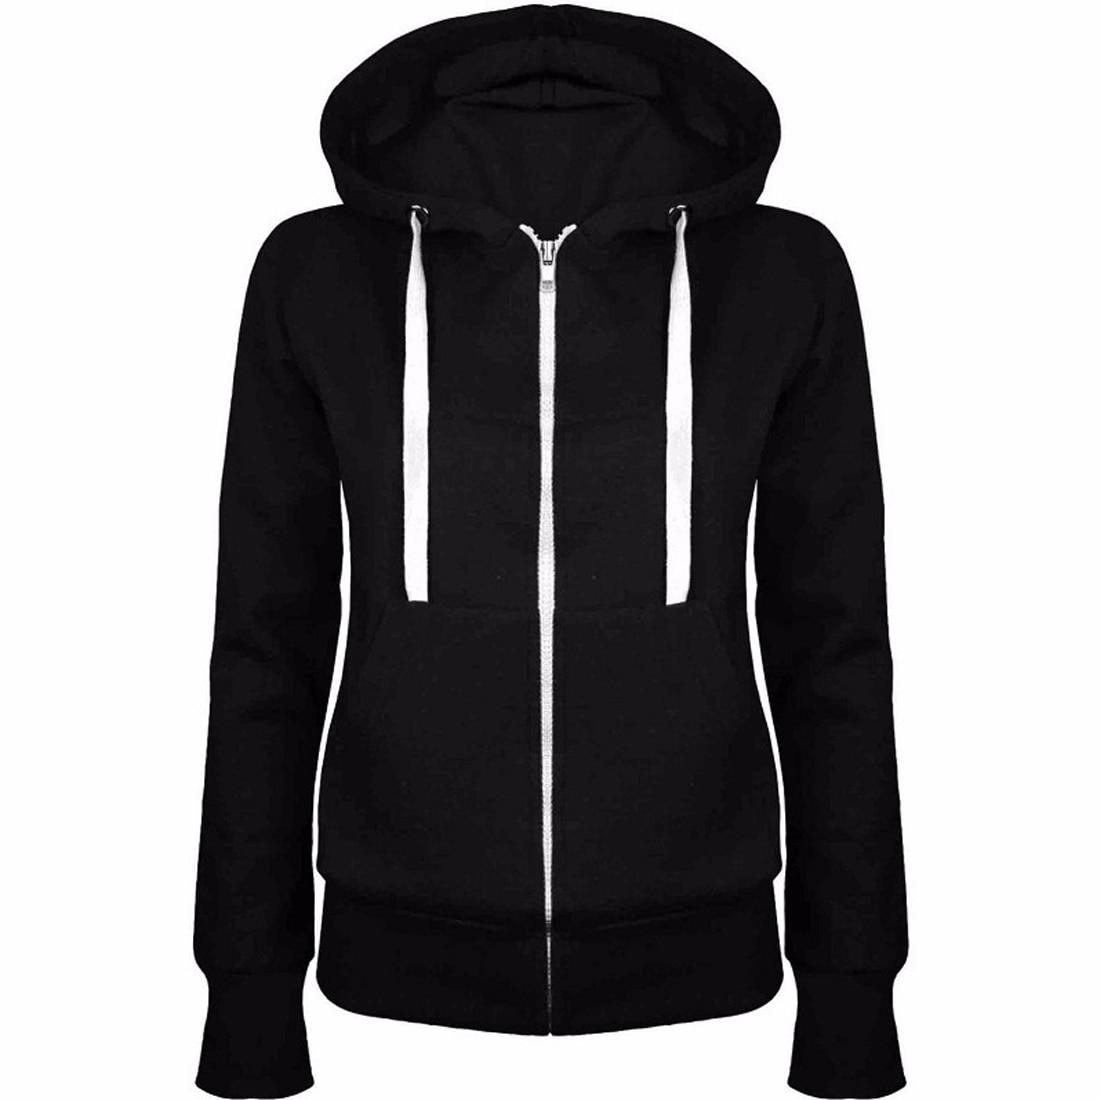 YJSFG HOUSE Fashion Women Coat Classic Thick Hooded Casual Sweatshirt Hoodie Jumper Top Warm Hip Hop Streetwear Zipper Home New